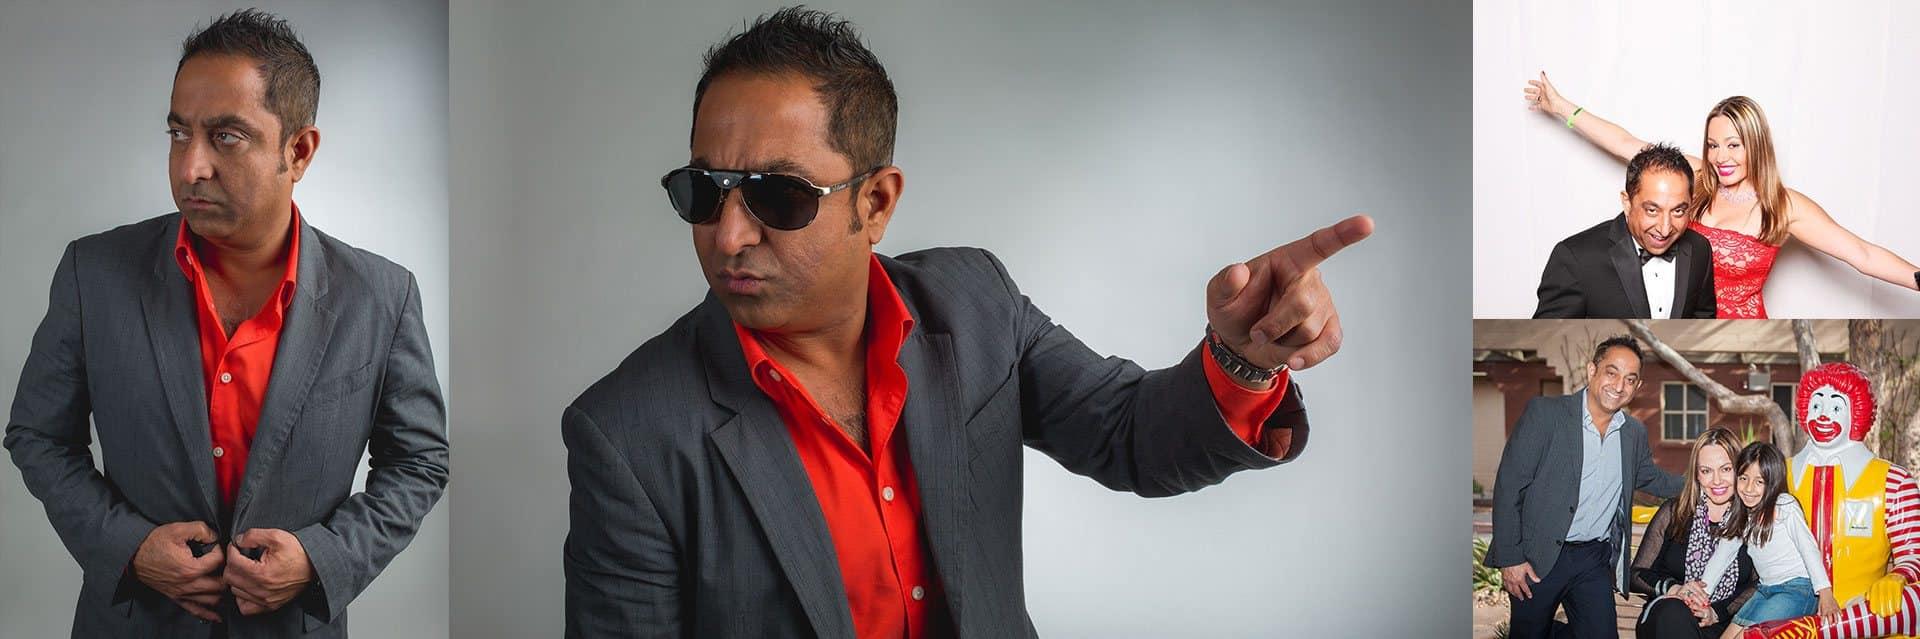 Manish Mamnani